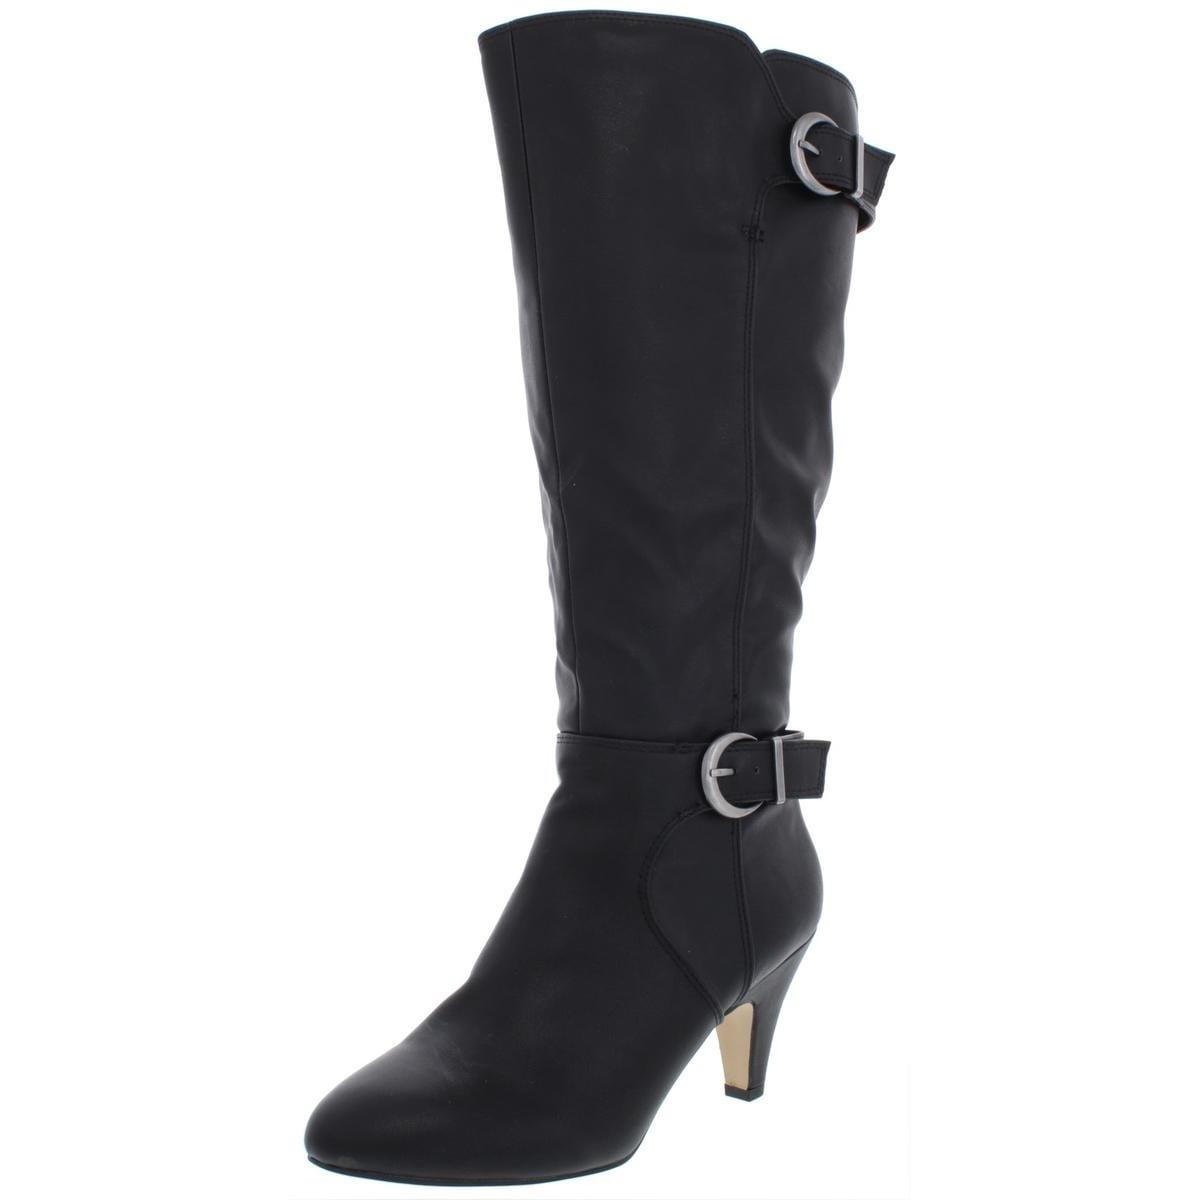 Details about Nikola Women's Knee High Side Zipper Faux Leather High Heel Boots Size 10